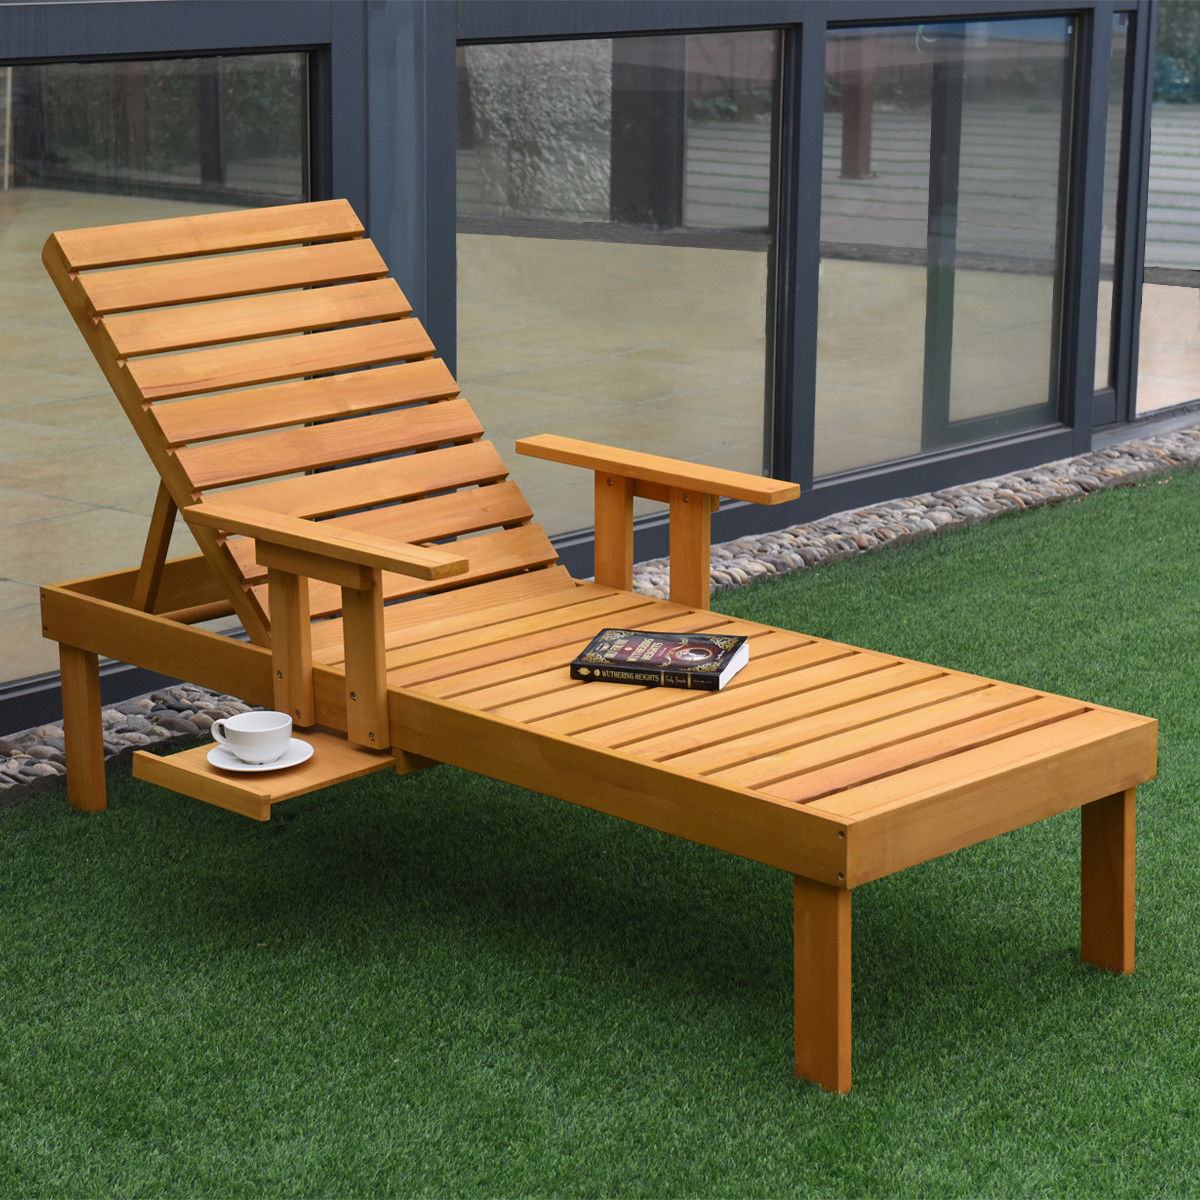 Us 129 99 Giantex Patio Chaise Sun Lounger Outdoor Furniture Garden Side Tray Deck Chair Modern Wood Beach Lounge Chair Hw56771 On Aliexpress